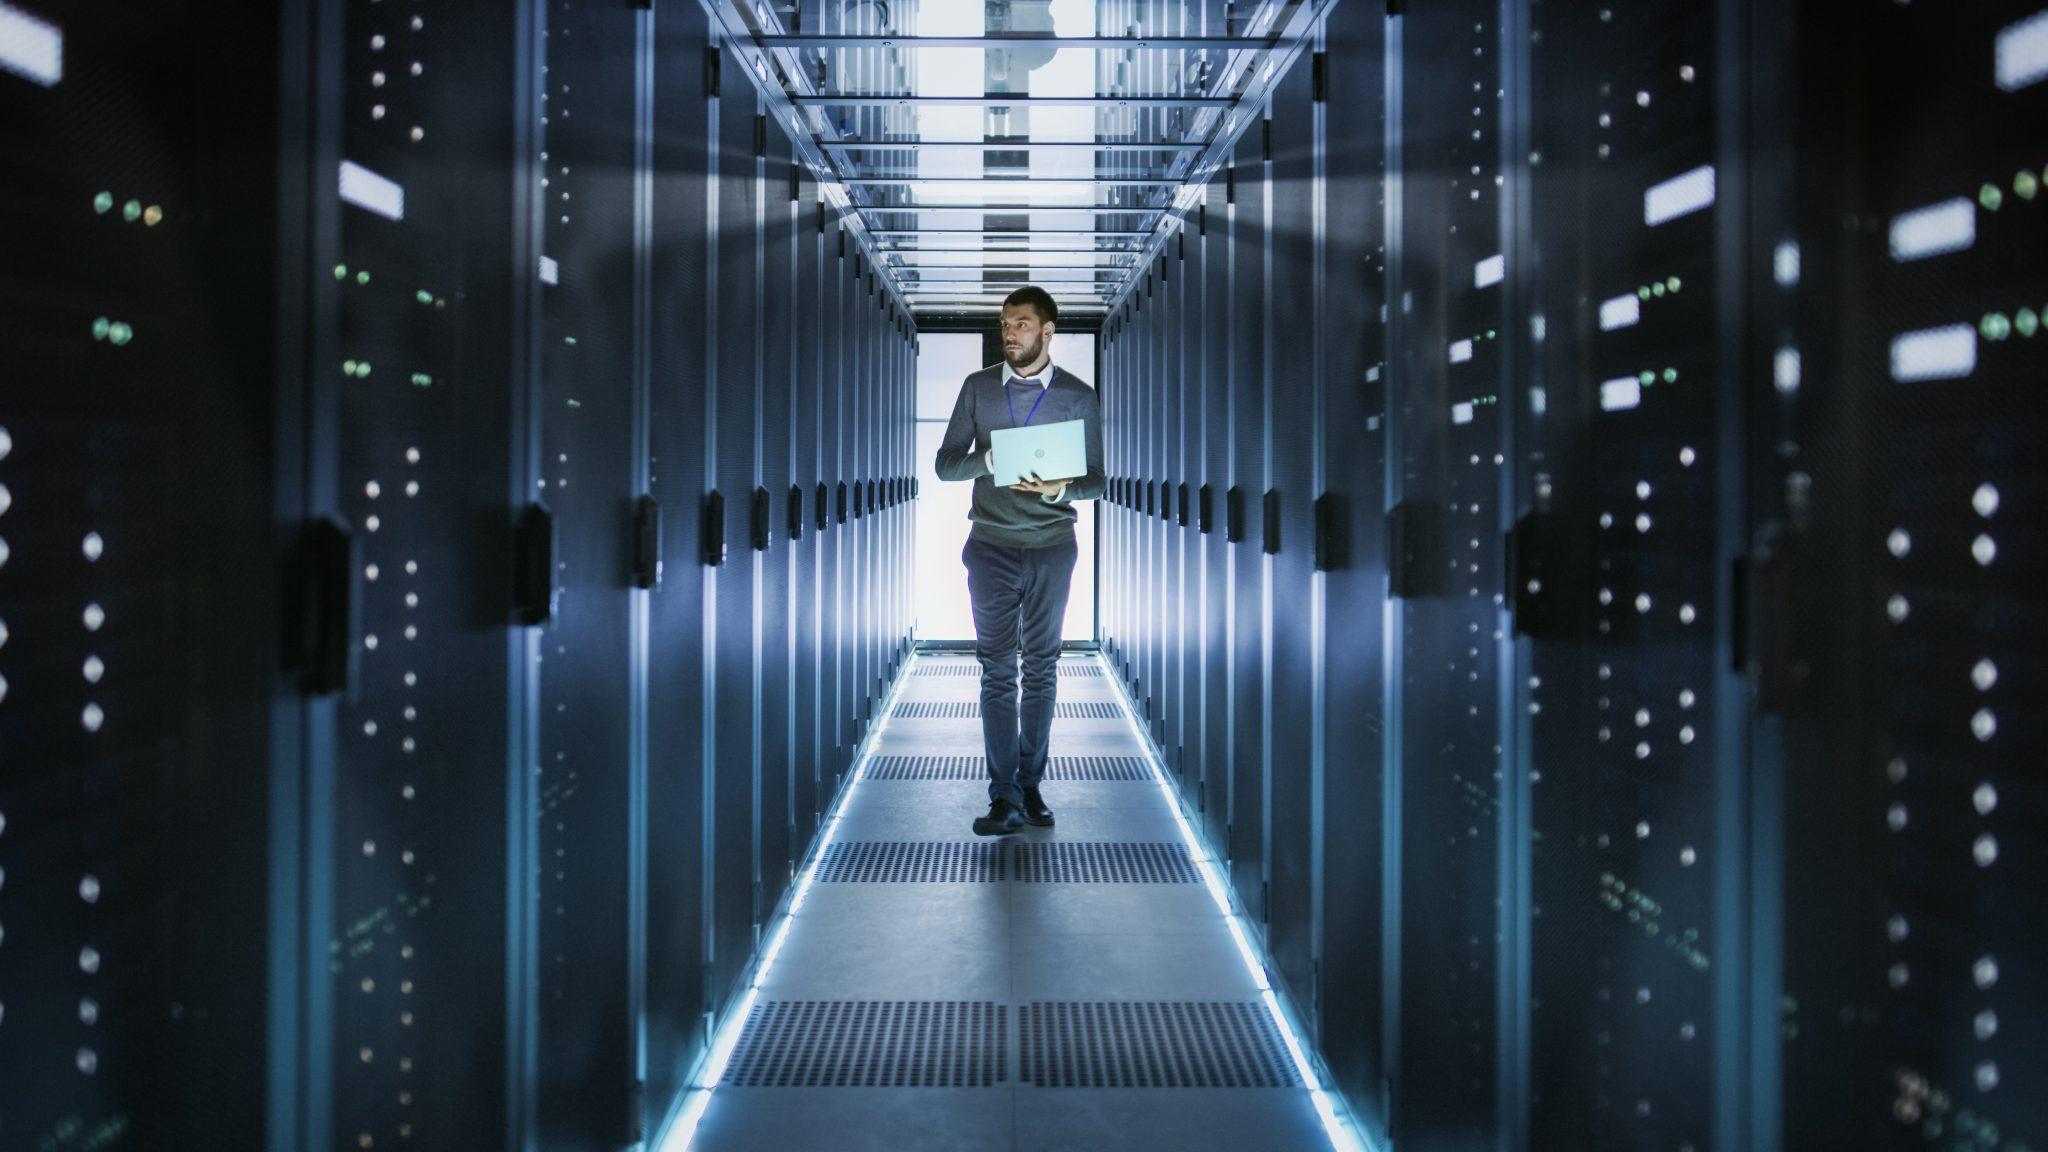 gestion de sistemas de informacion de keiser university